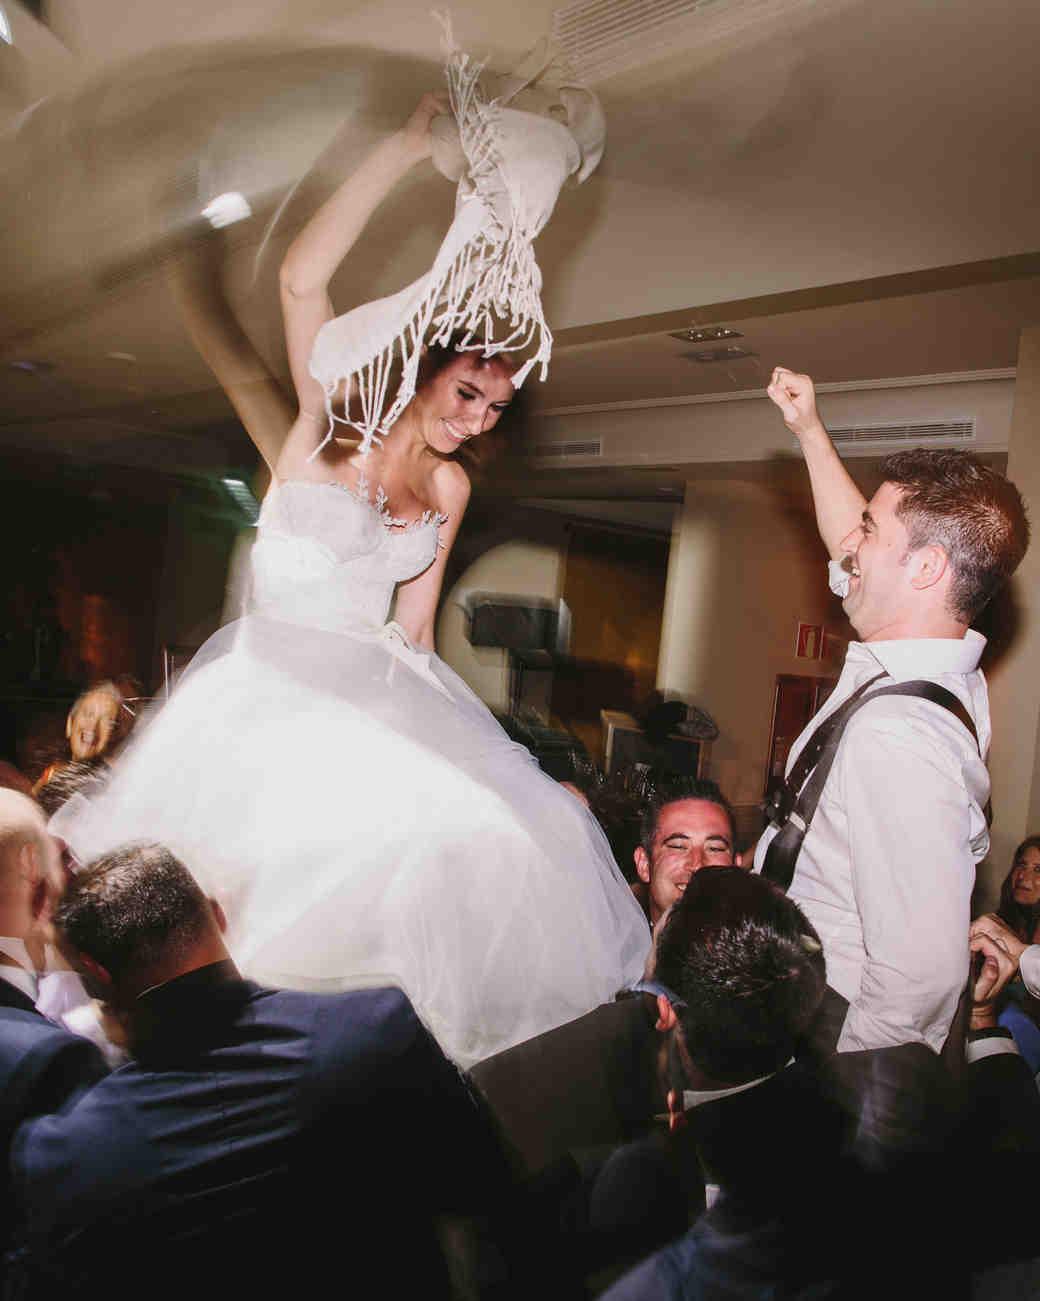 tamara-brett-wedding-dancing-1863-s112120-0915.jpg